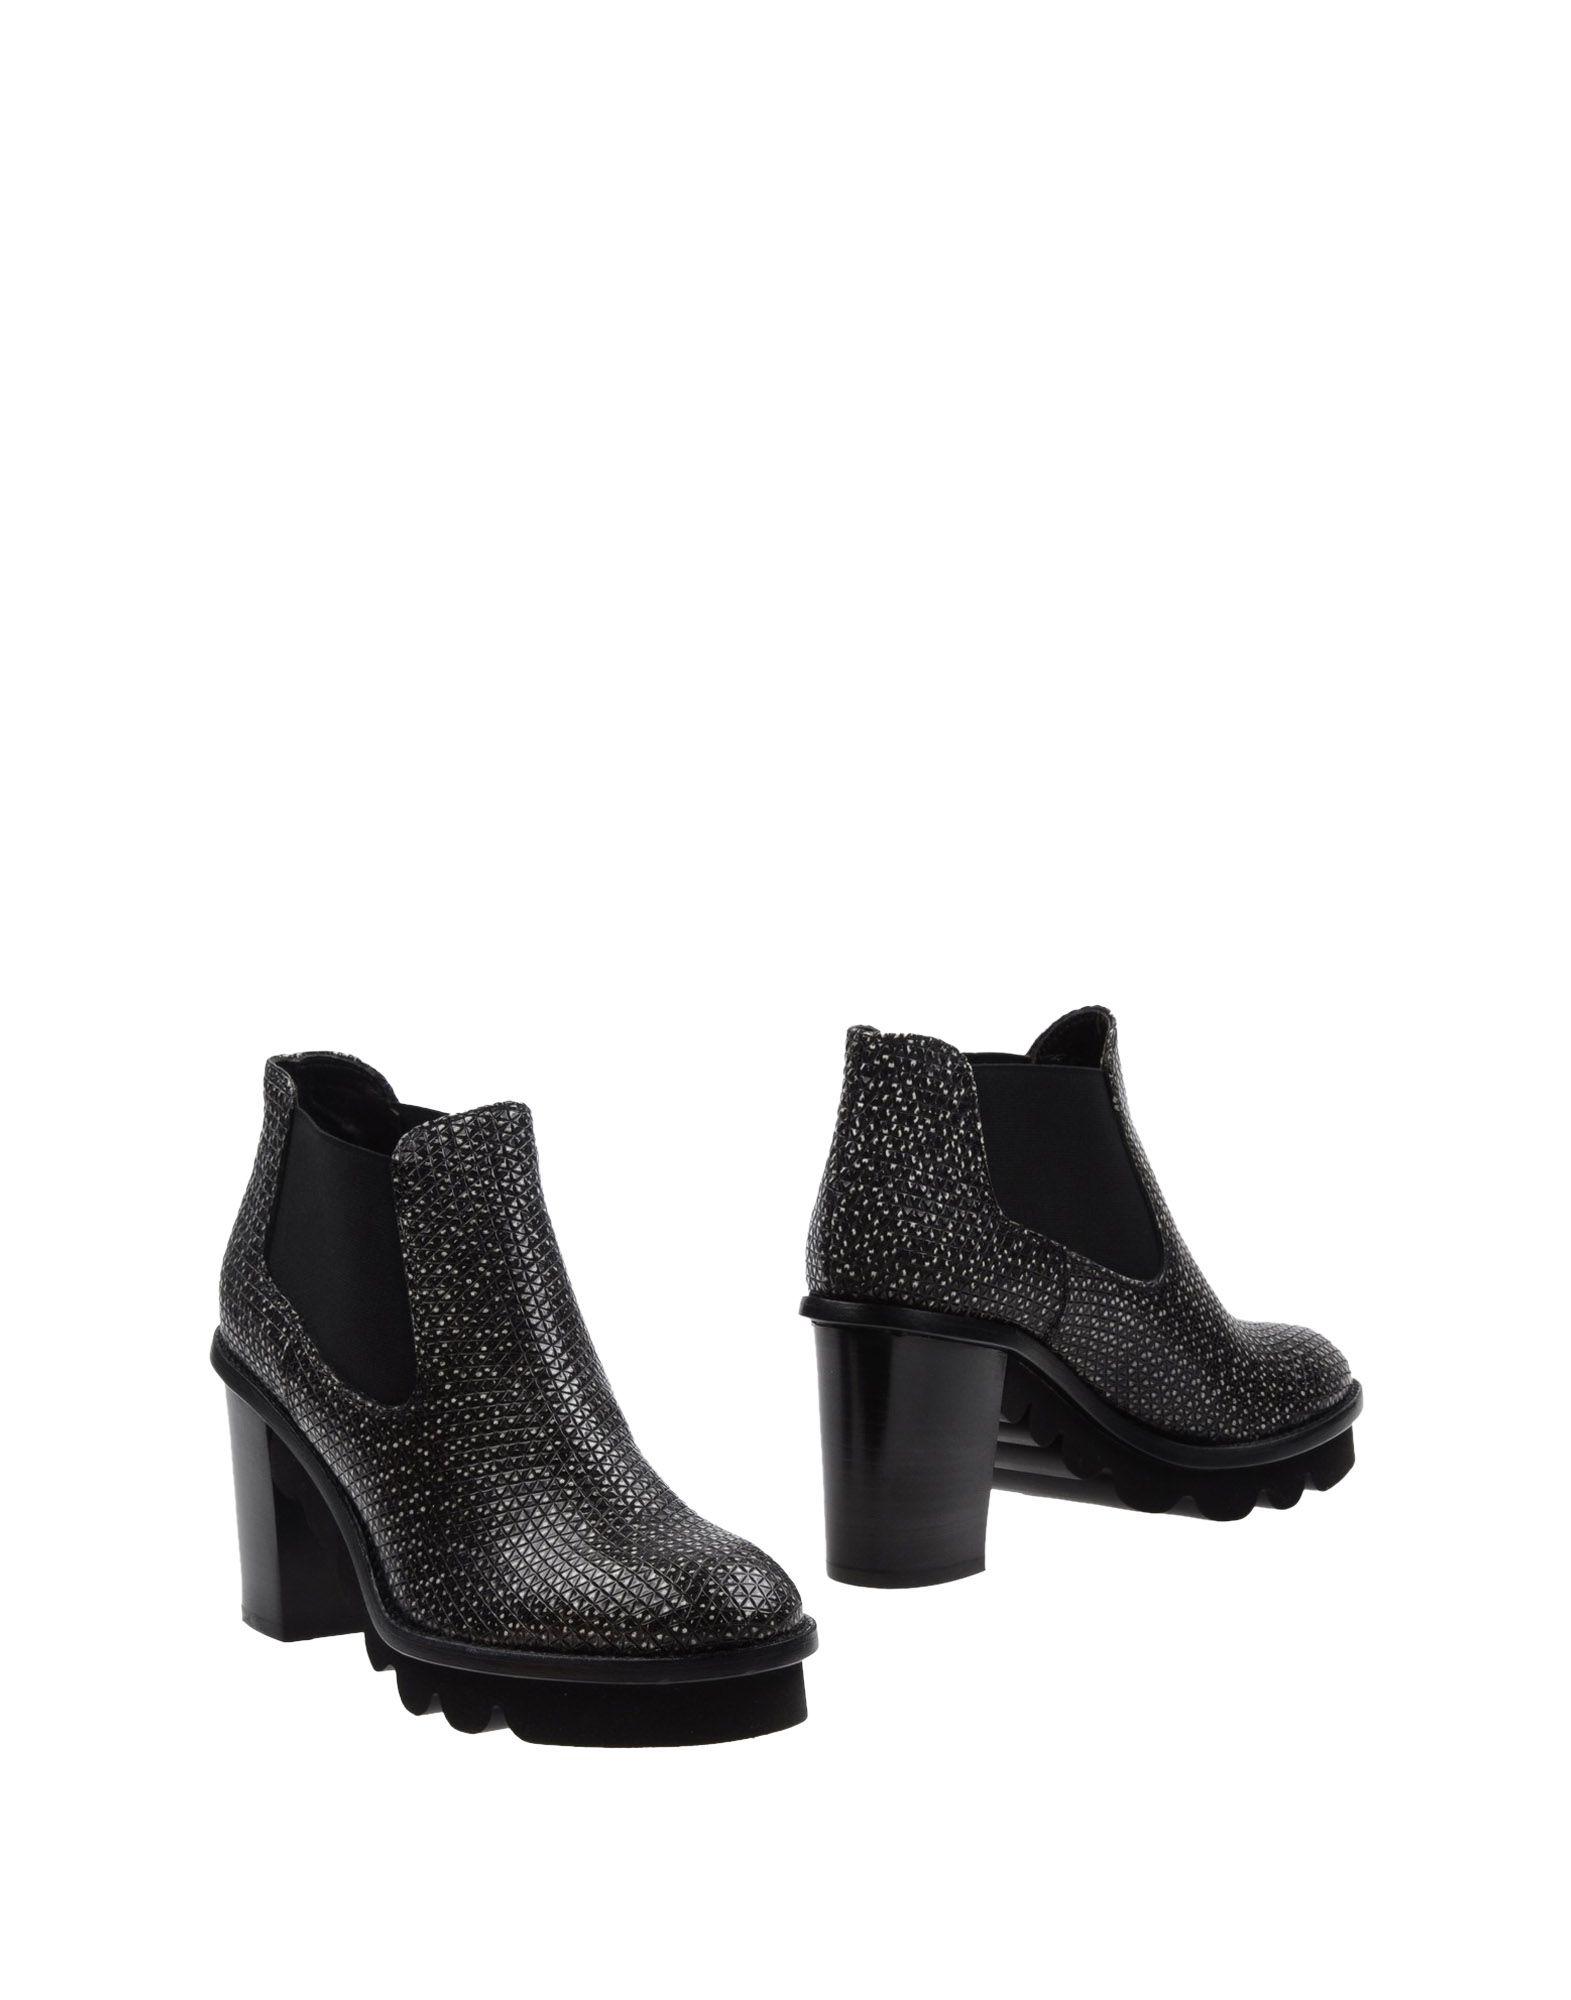 AGL ATTILIO GIUSTI LEOMBRUNI Полусапоги и высокие ботинки цены онлайн